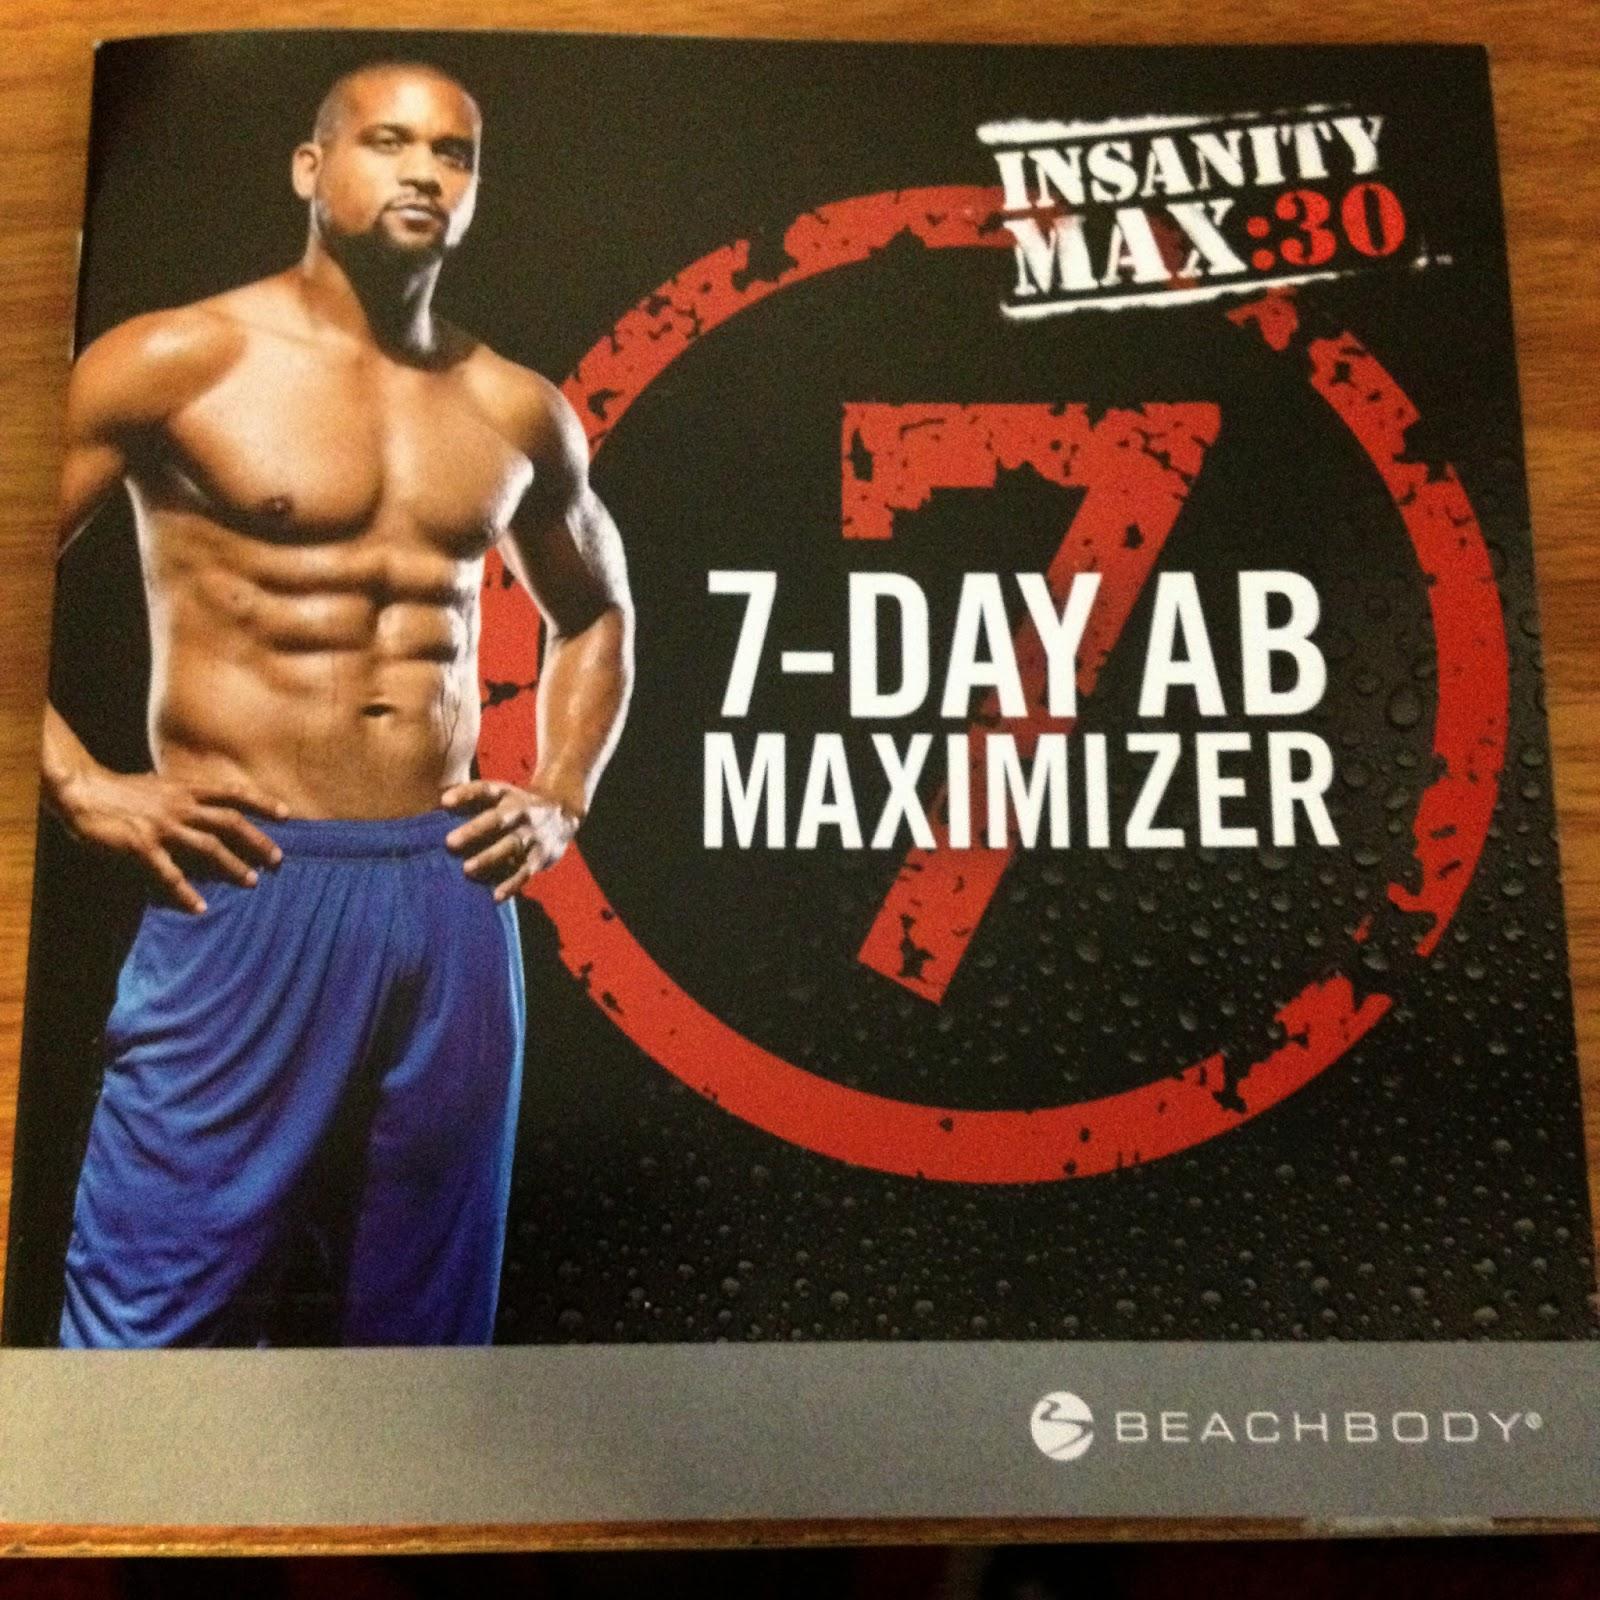 Team Soar Fitness: Insanity Max 30 7-DAY AB MAXIMIZER